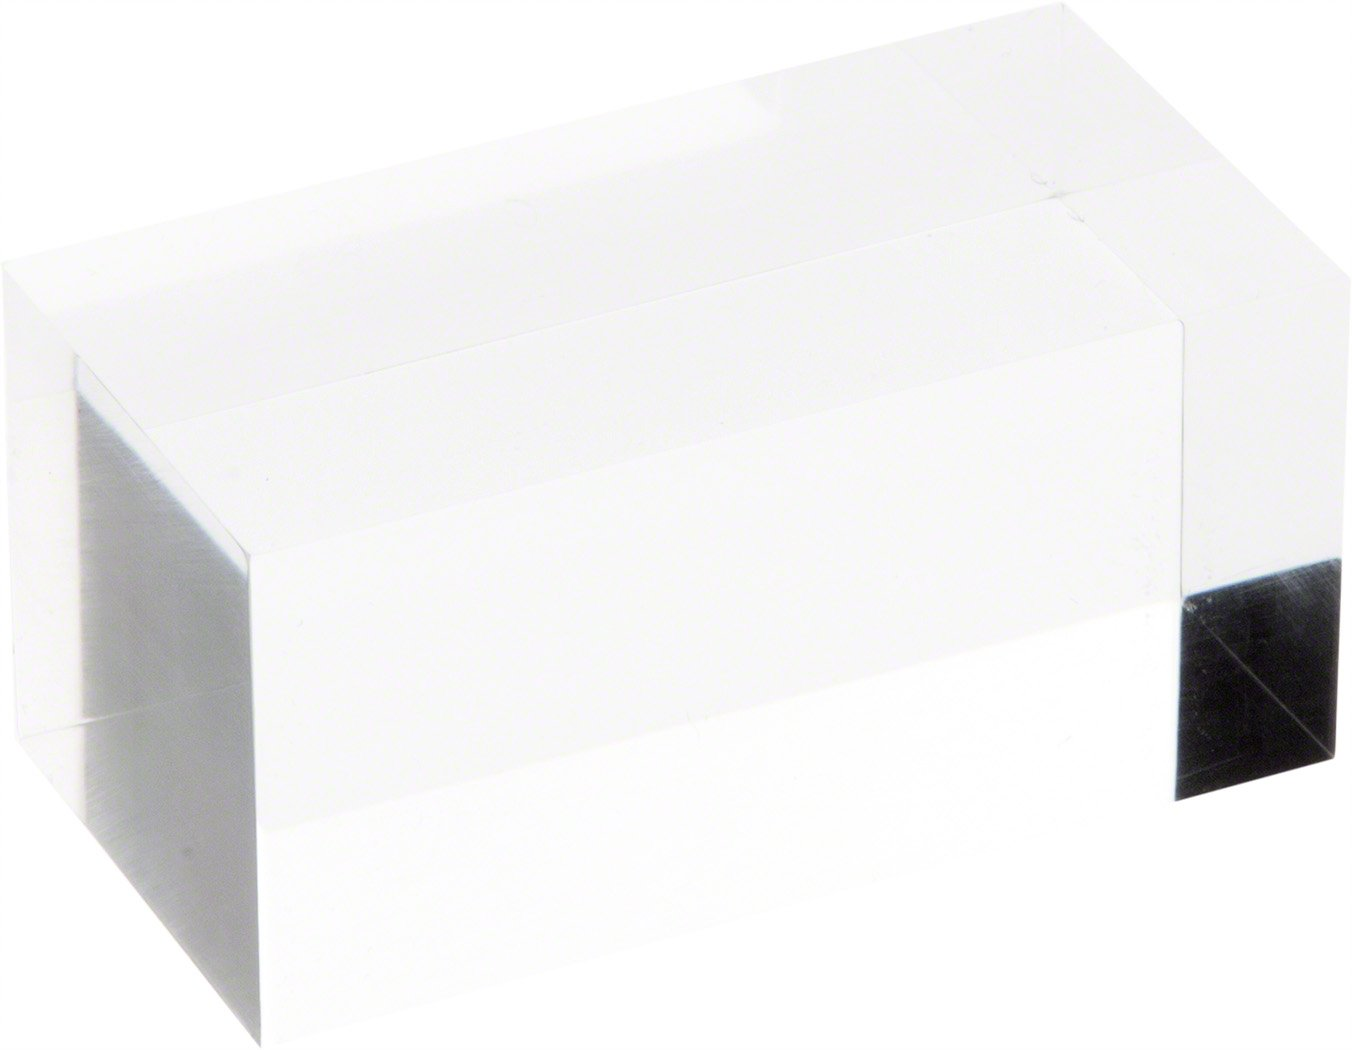 1.5 H x 1.5 W x 3 D Plymor Brand Clear Polished Acrylic Rectangular Display Block